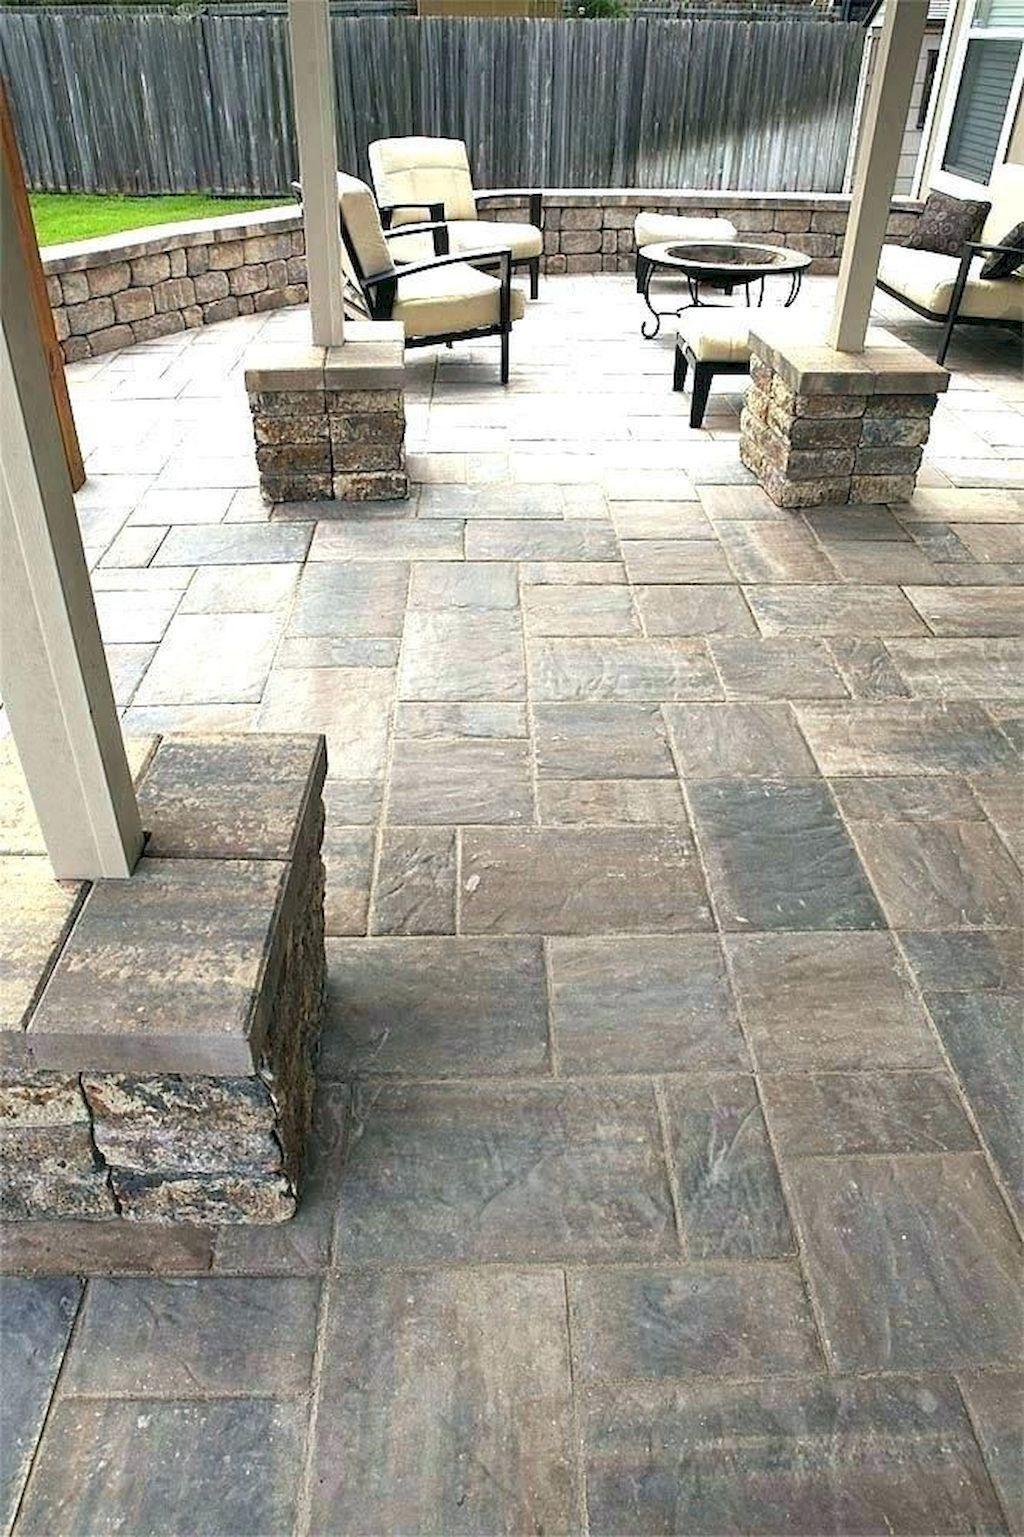 13 Backyard Patio Floors Patio Floor Design Ideas Orice In 2020 Patio Tiles Outdoor Patio Decor Patio Pavers Design